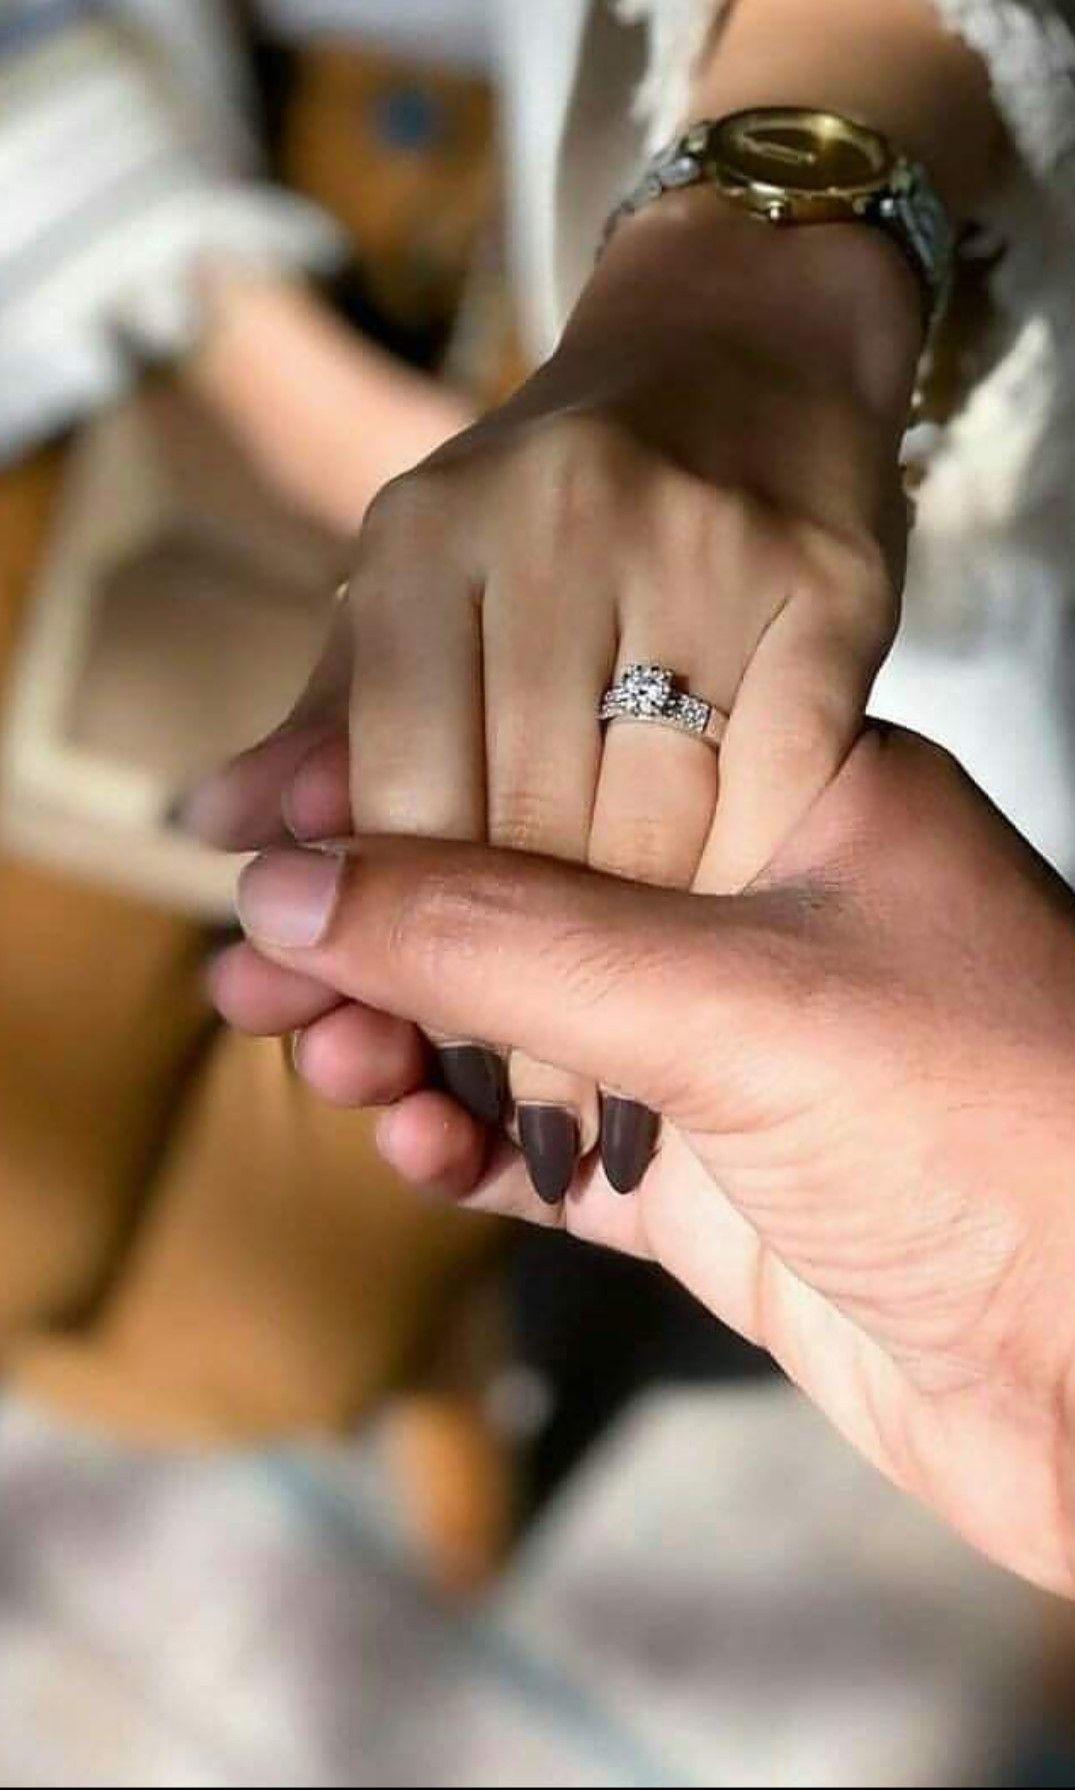 Pin By Osama Ahmed On دبلة الخطوبة In 2021 Engagement Rings Wedding Rings Bulls Wallpaper